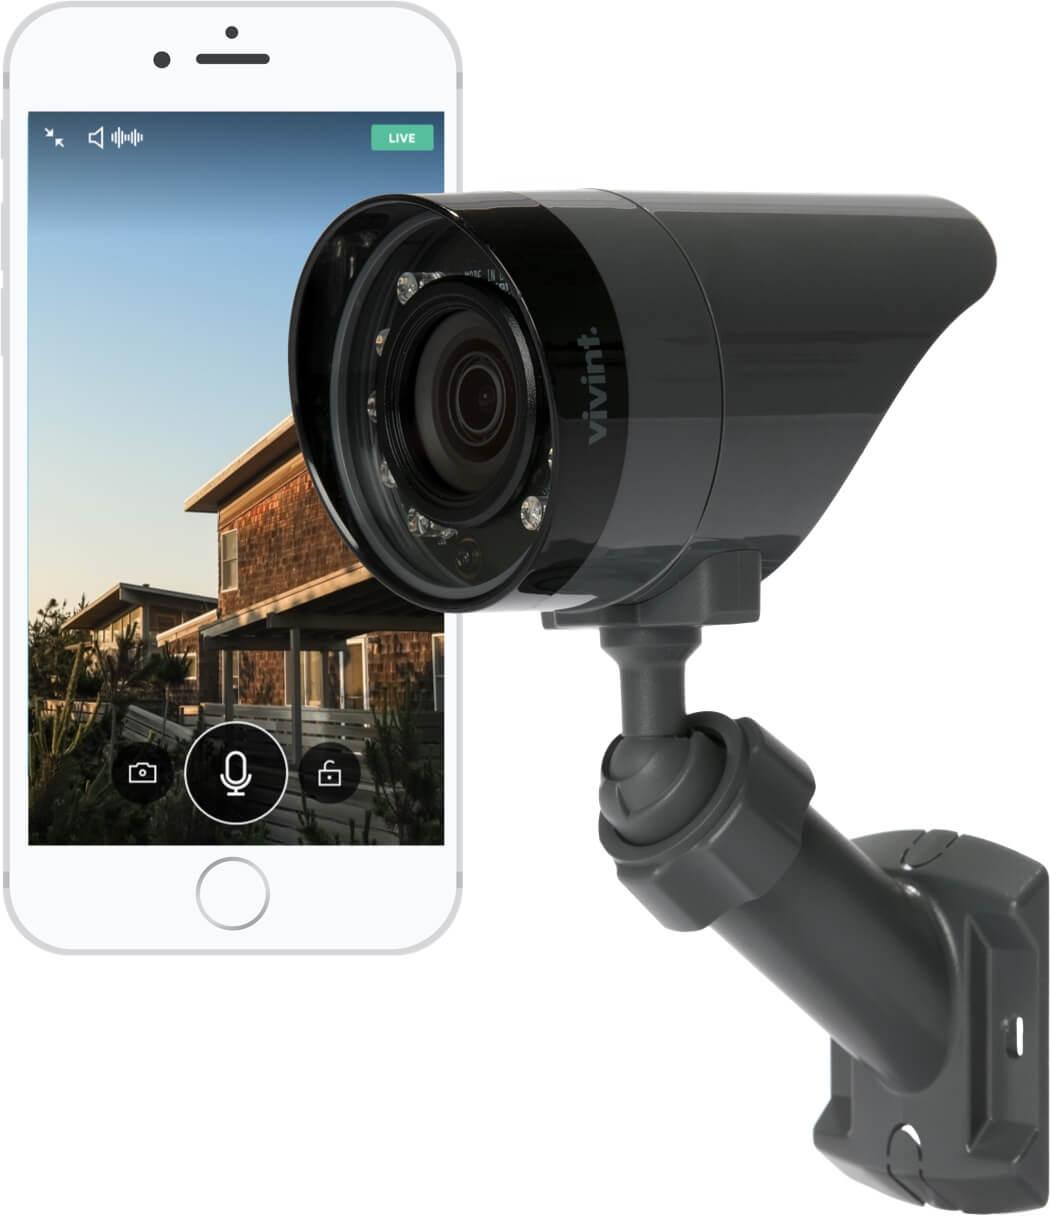 Outdoor Surveillance Camera  8557424173  Vivint